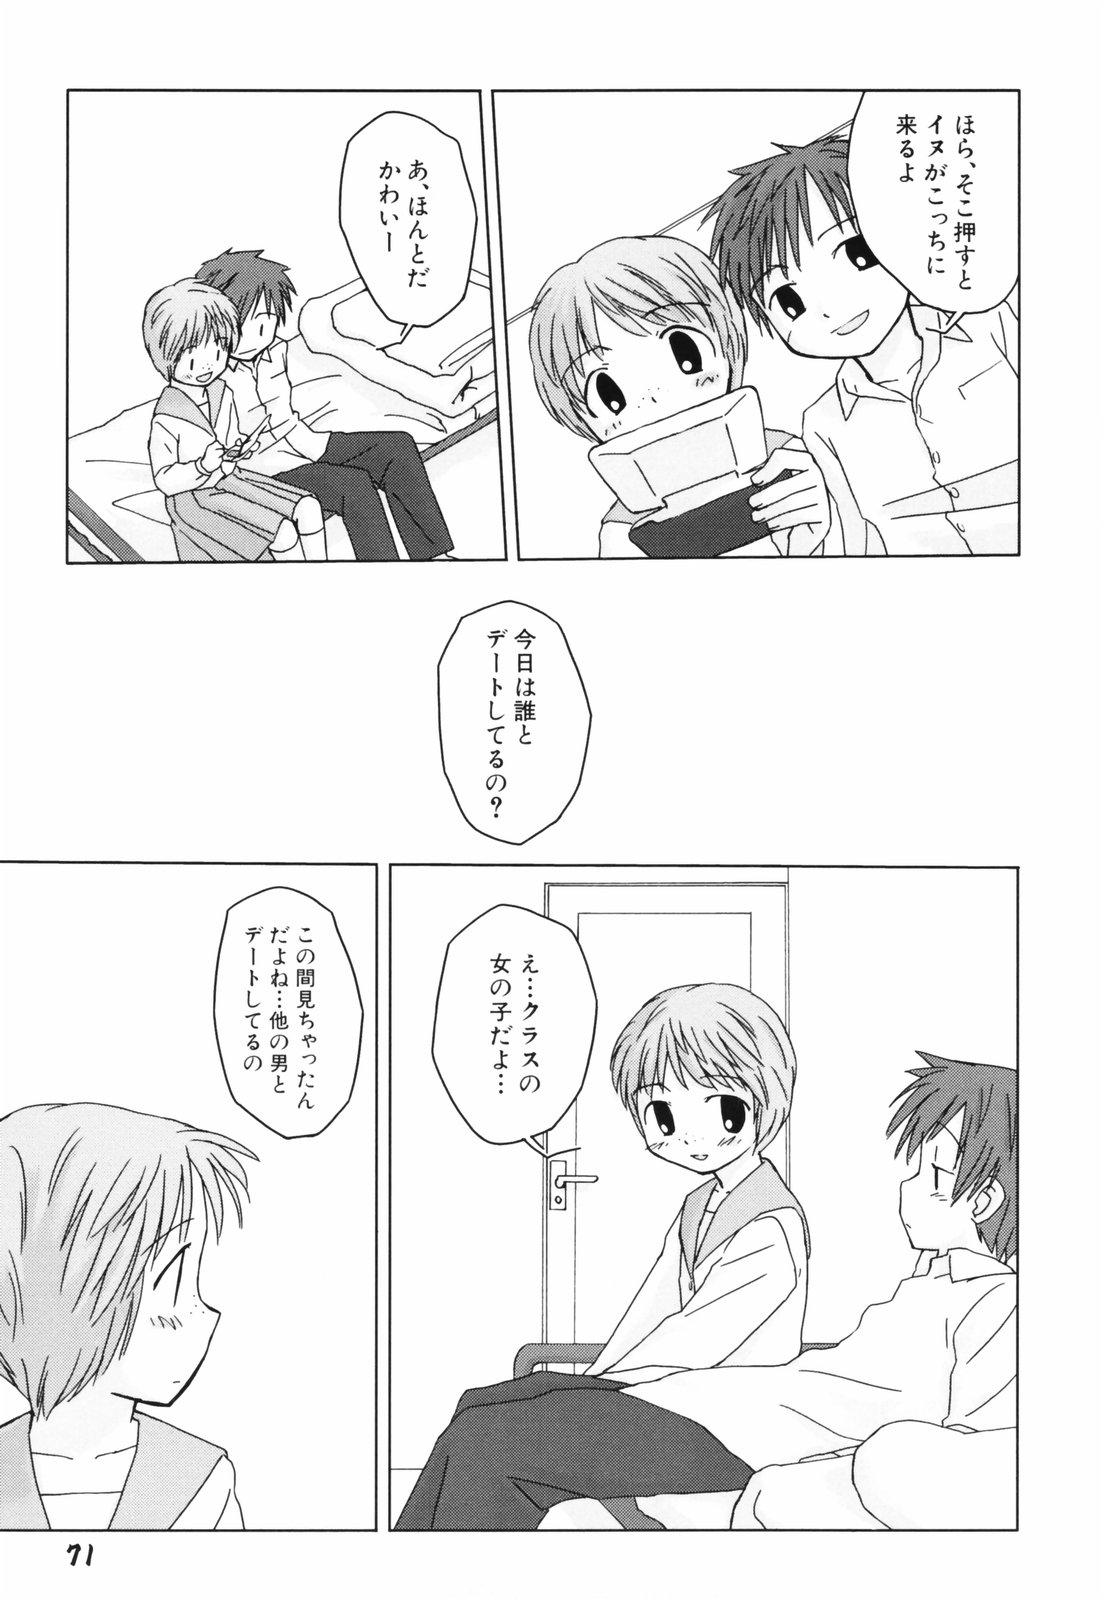 Hanjuku Shoujo 73